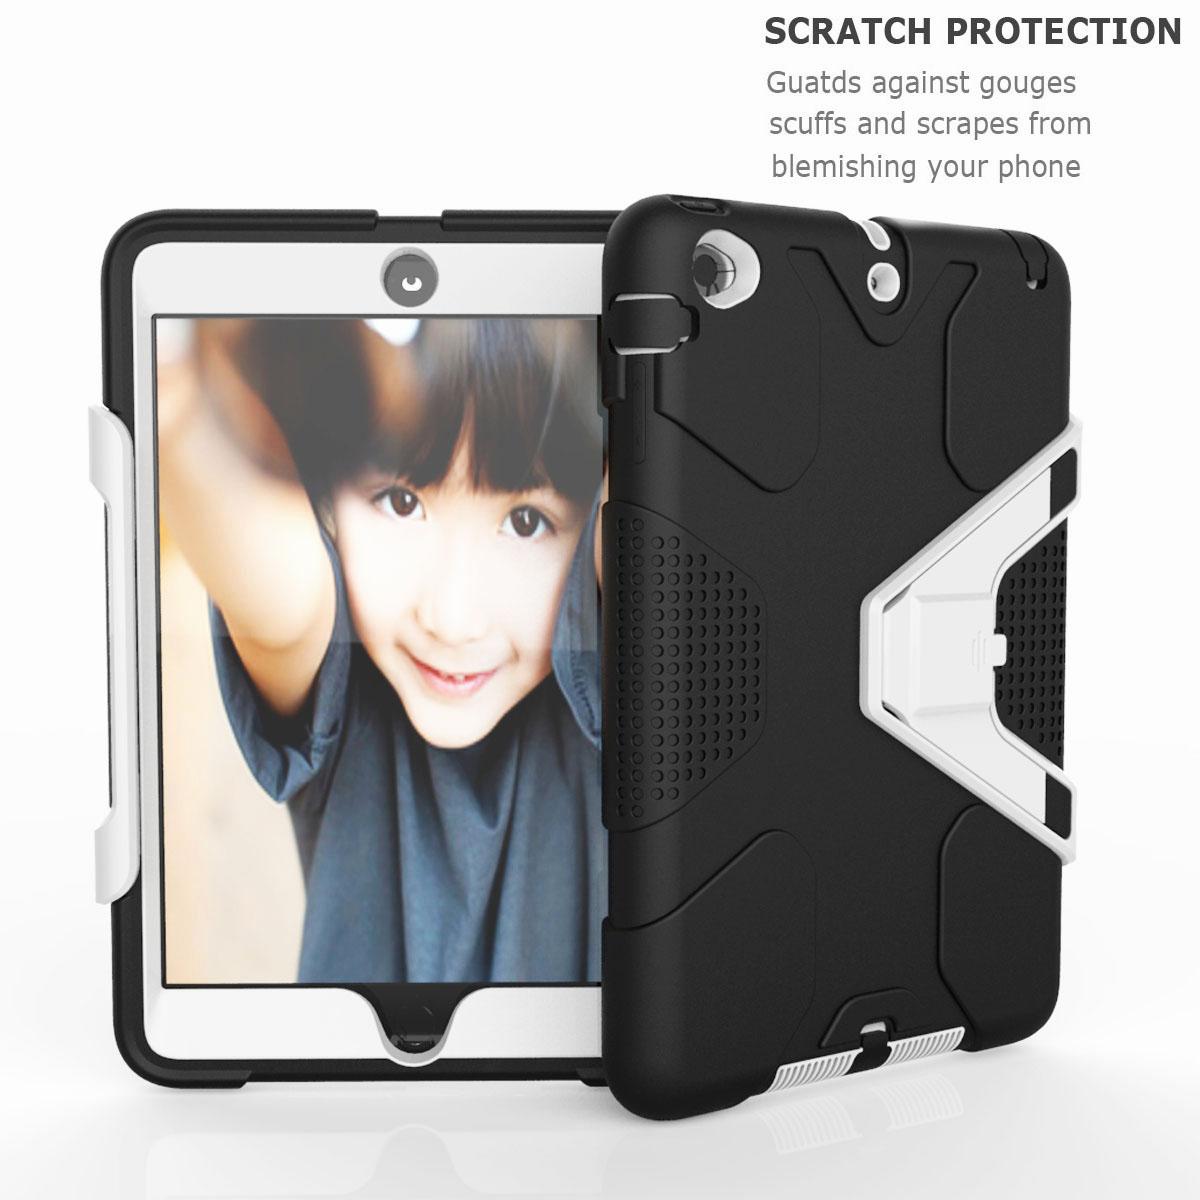 Luxury-Shockproof-Tough-Armor-with-Hard-Kickstand-Case-For-Apple-iPad-Mini-1-2-3 thumbnail 54